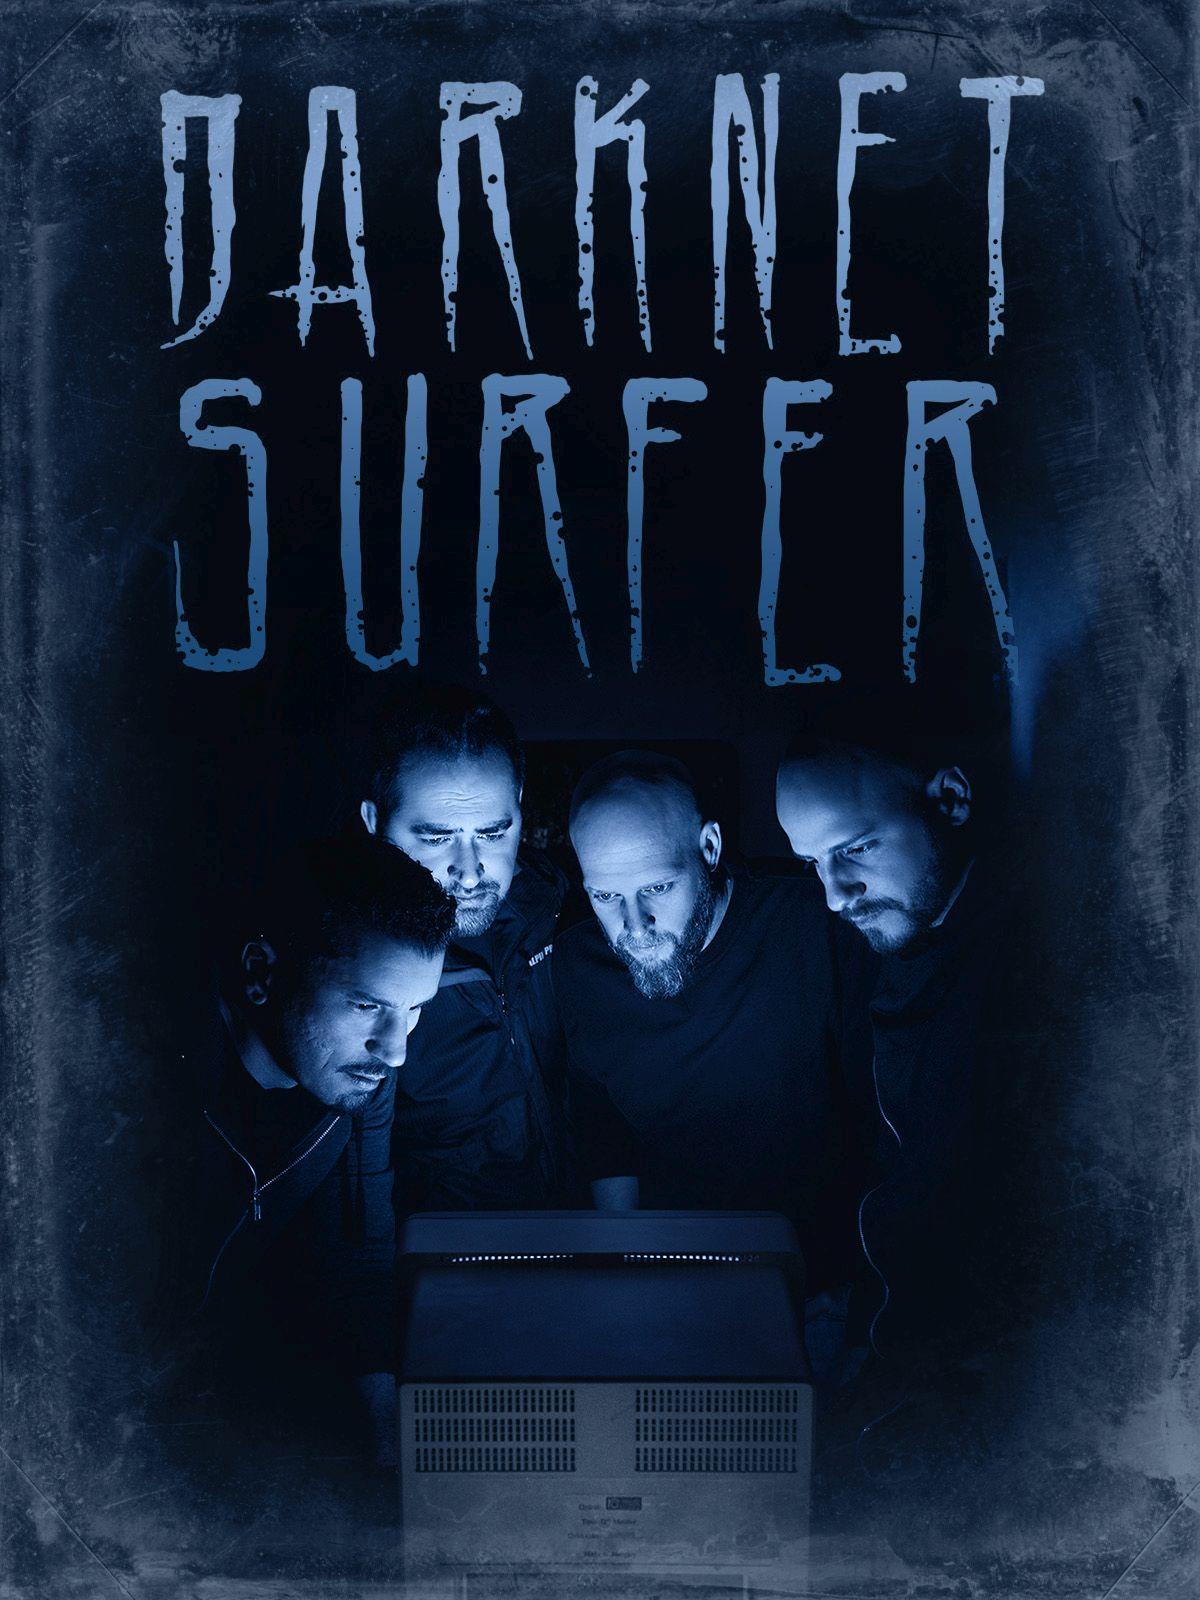 darknet_surfer_promo_03.jpg